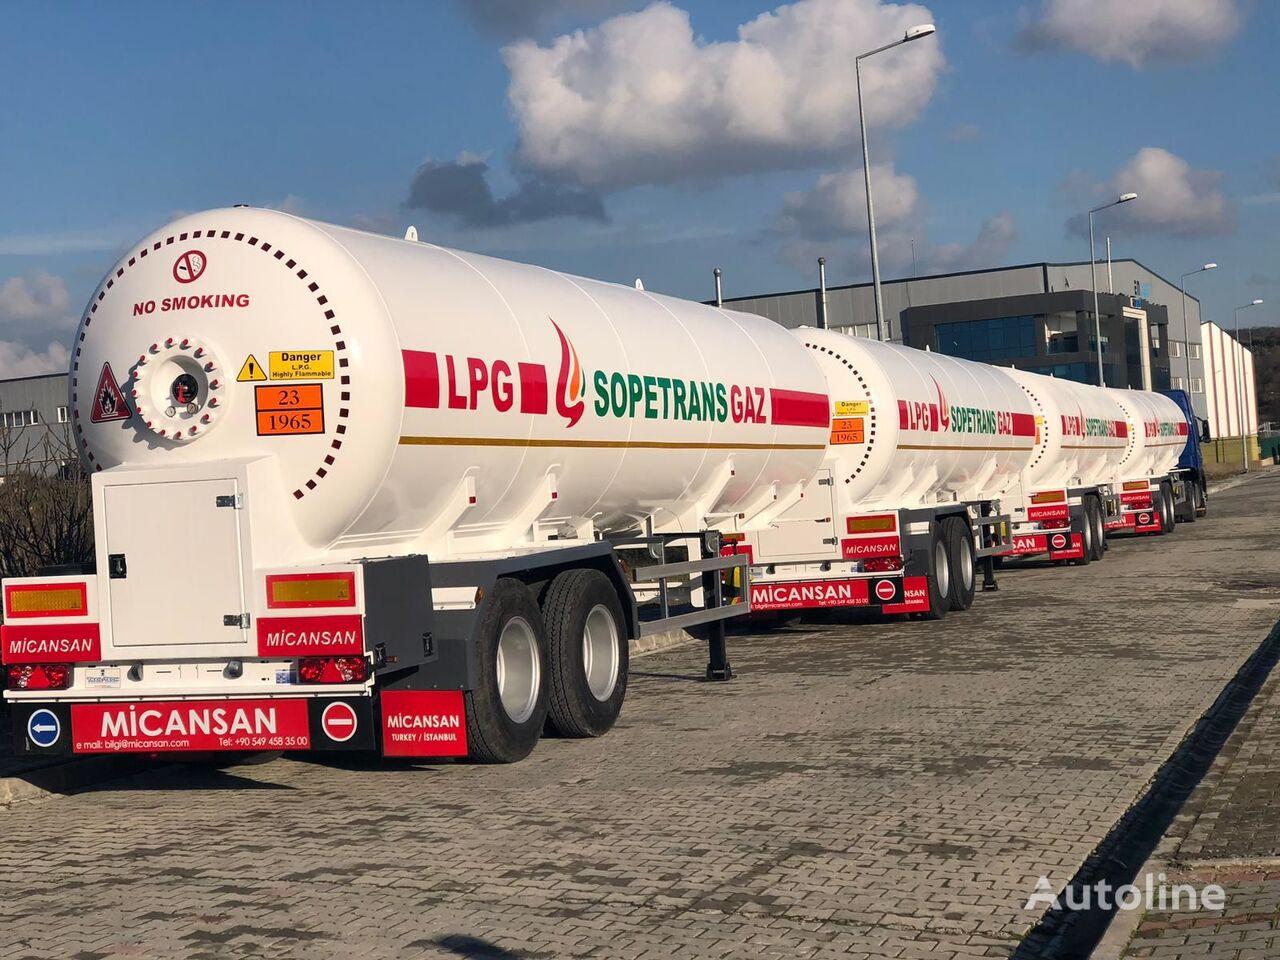 нови цистерна за гас Micansan